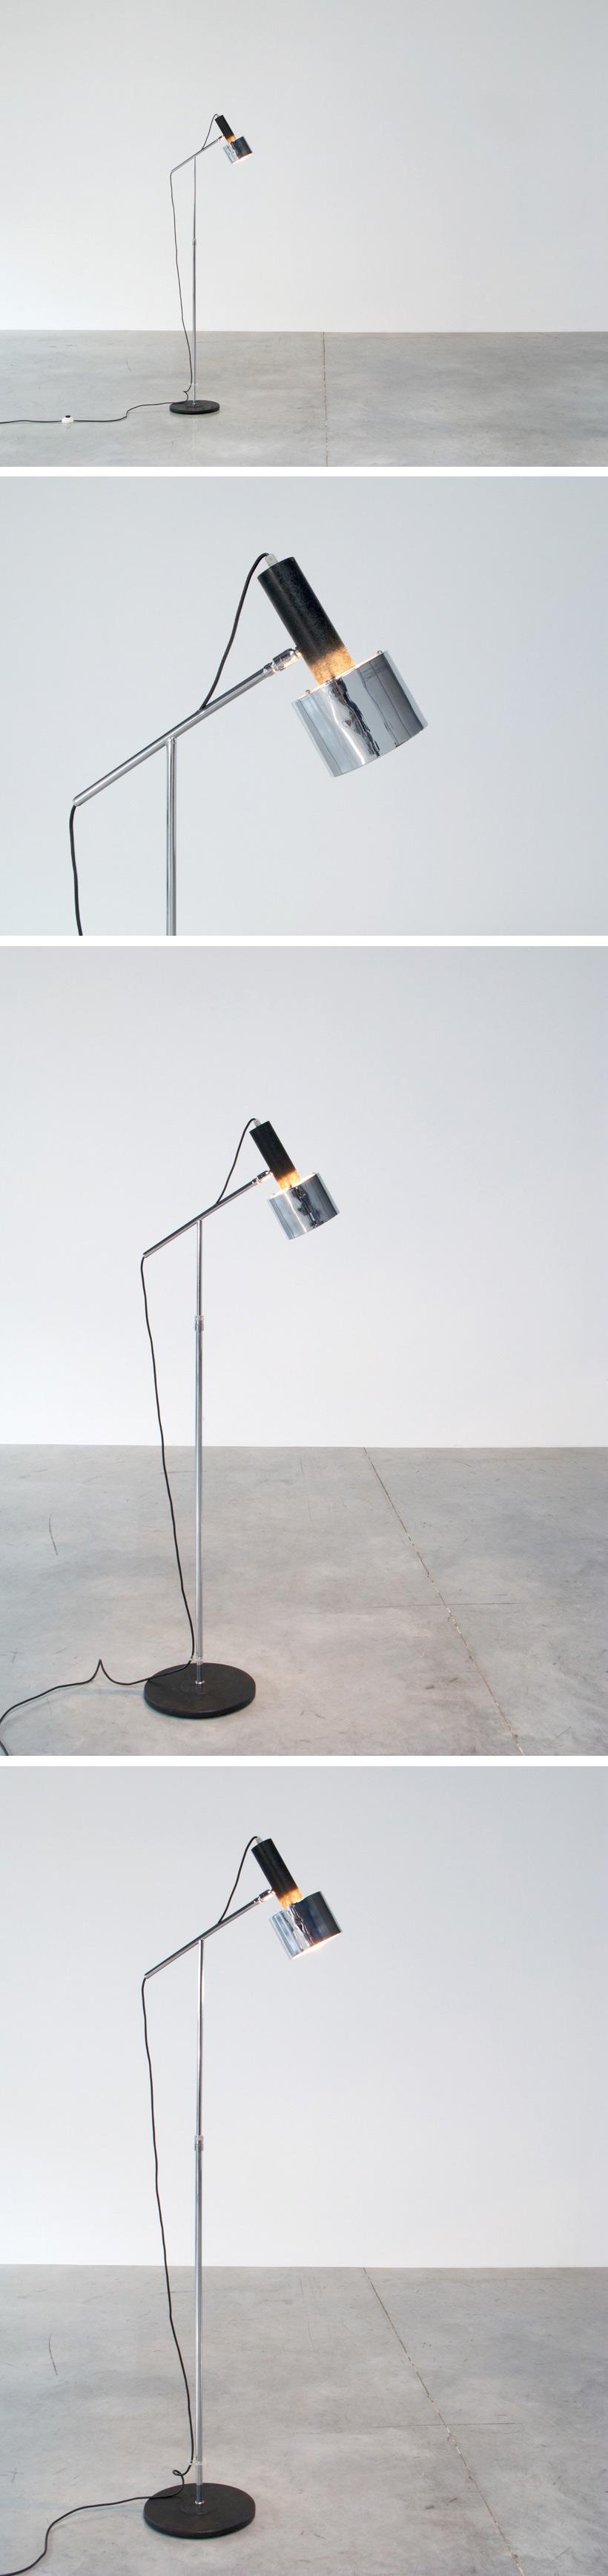 Chrome floor lamp reading lamp circa 1970 Large